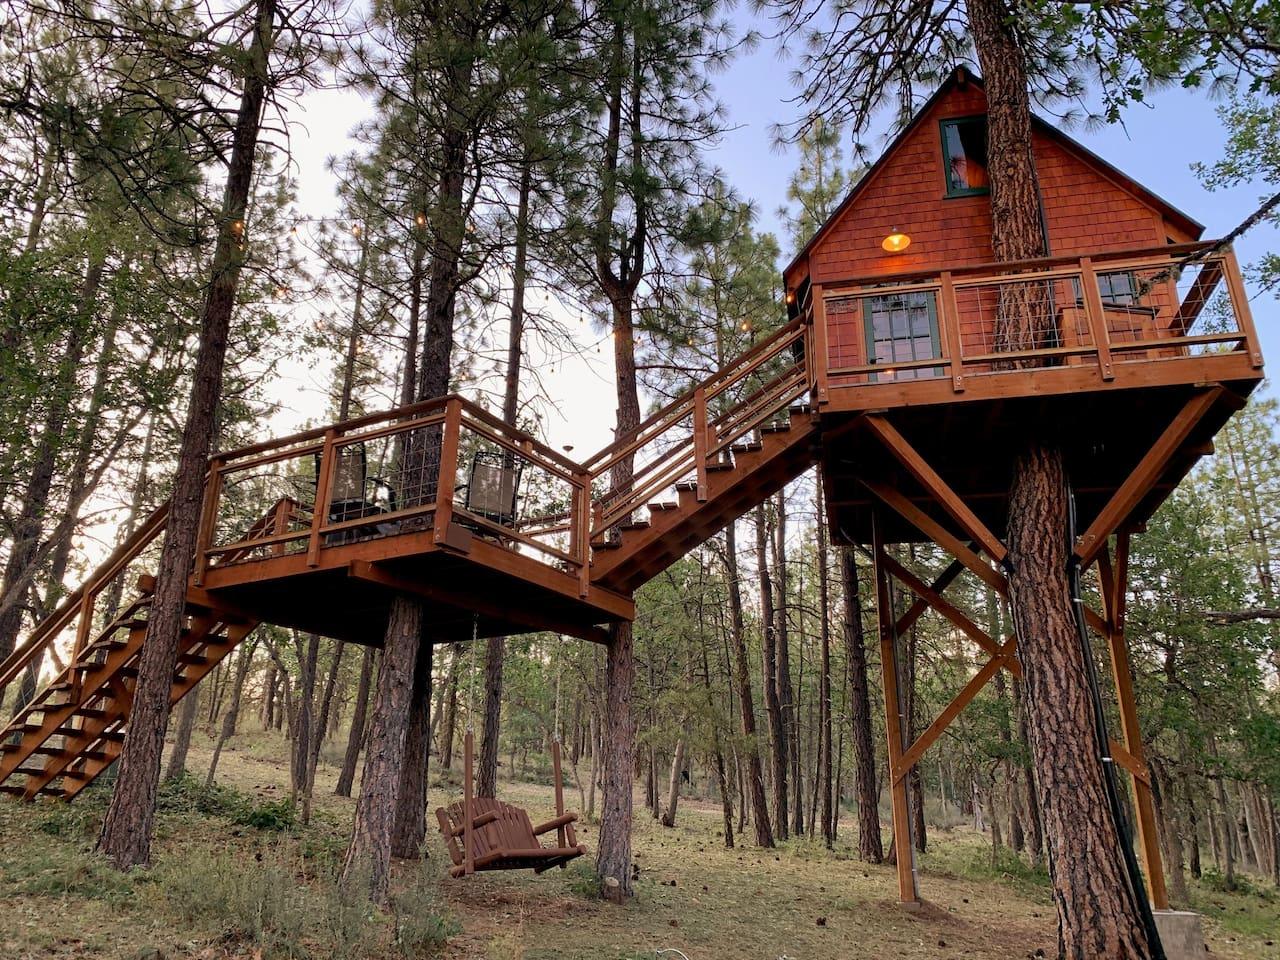 Amazing Treehouse escape!